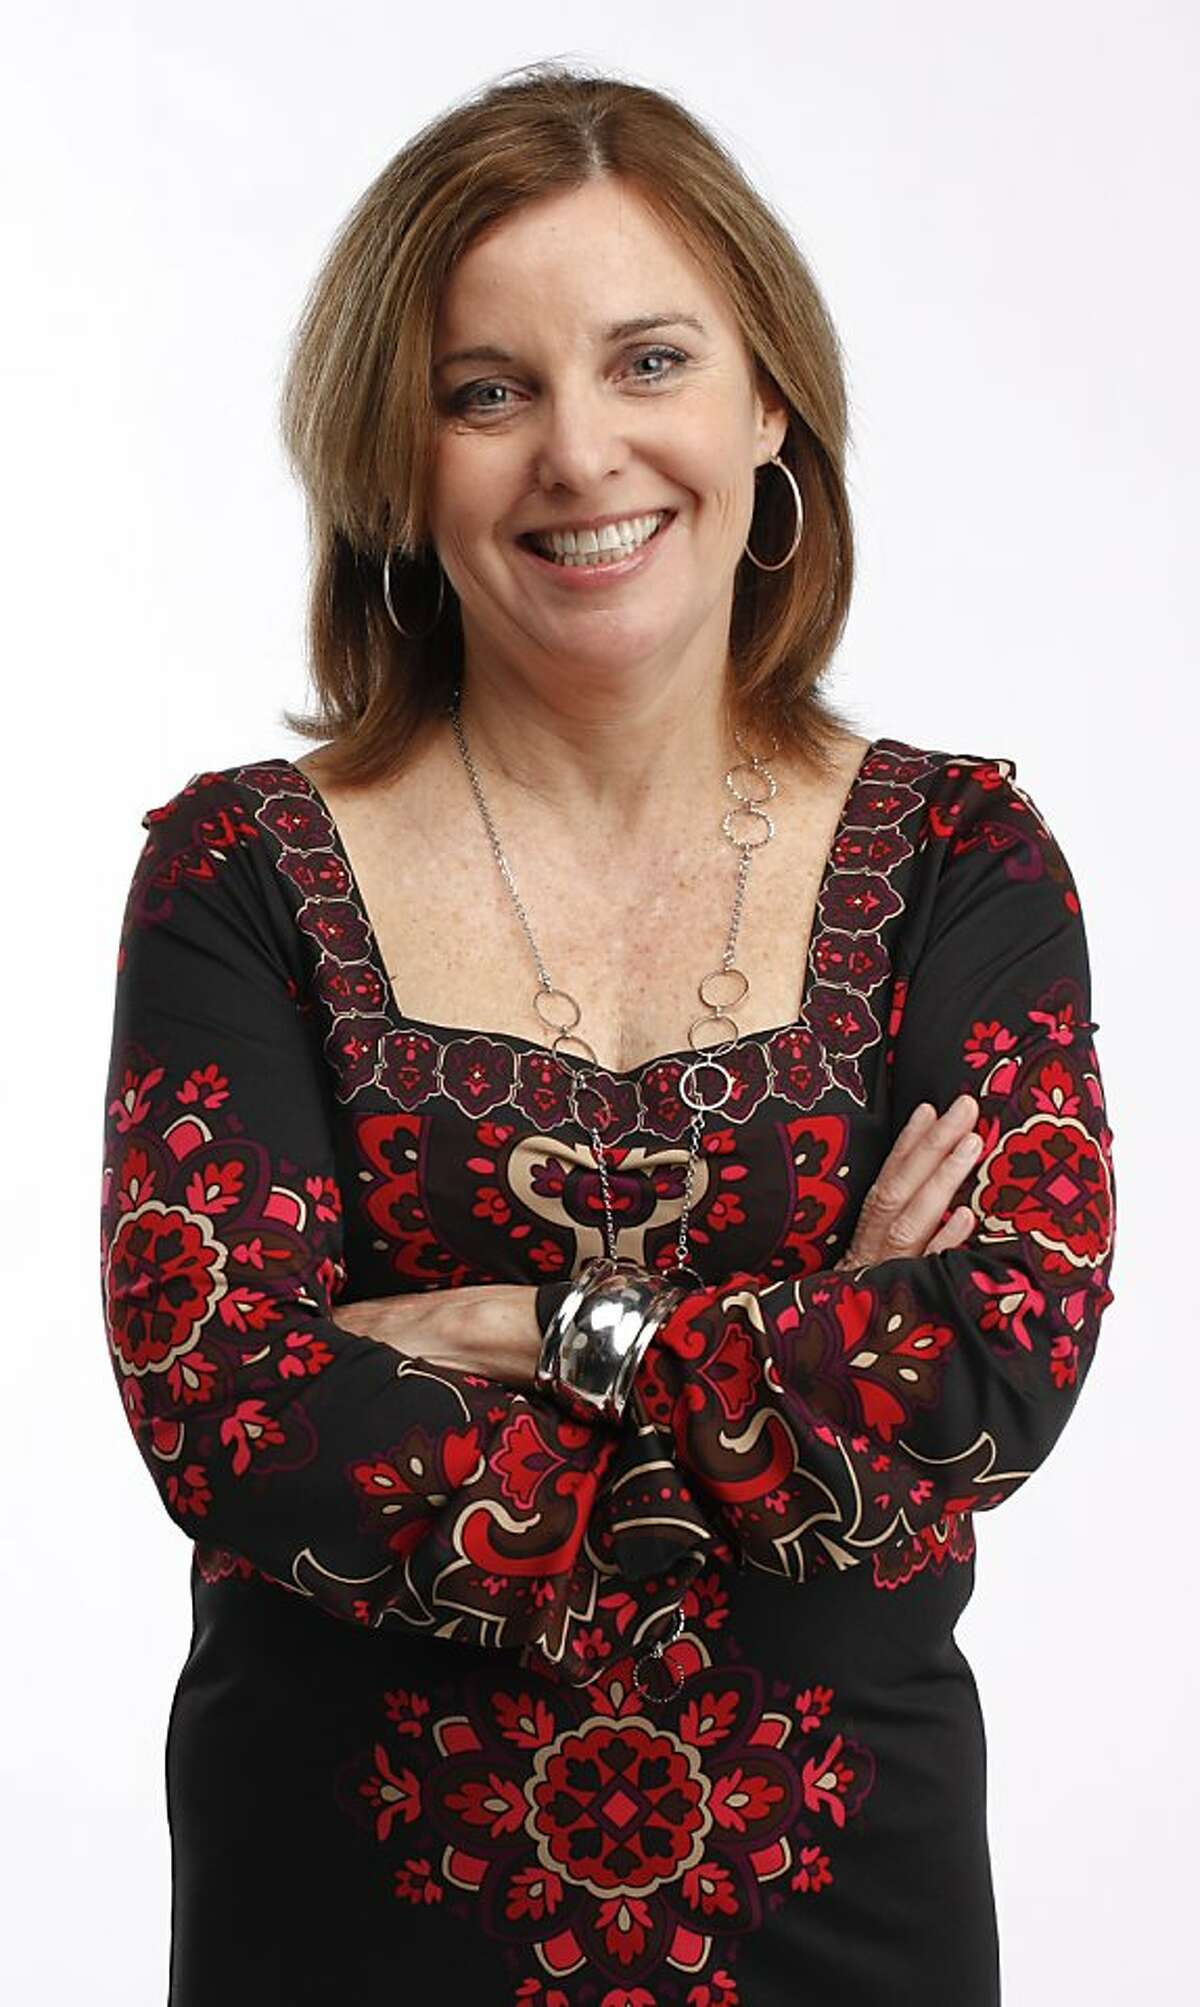 Ann Killion, Chronicle columnist, is seen on Monday, Dec. 10, 2012 in San Francisco, Calif.